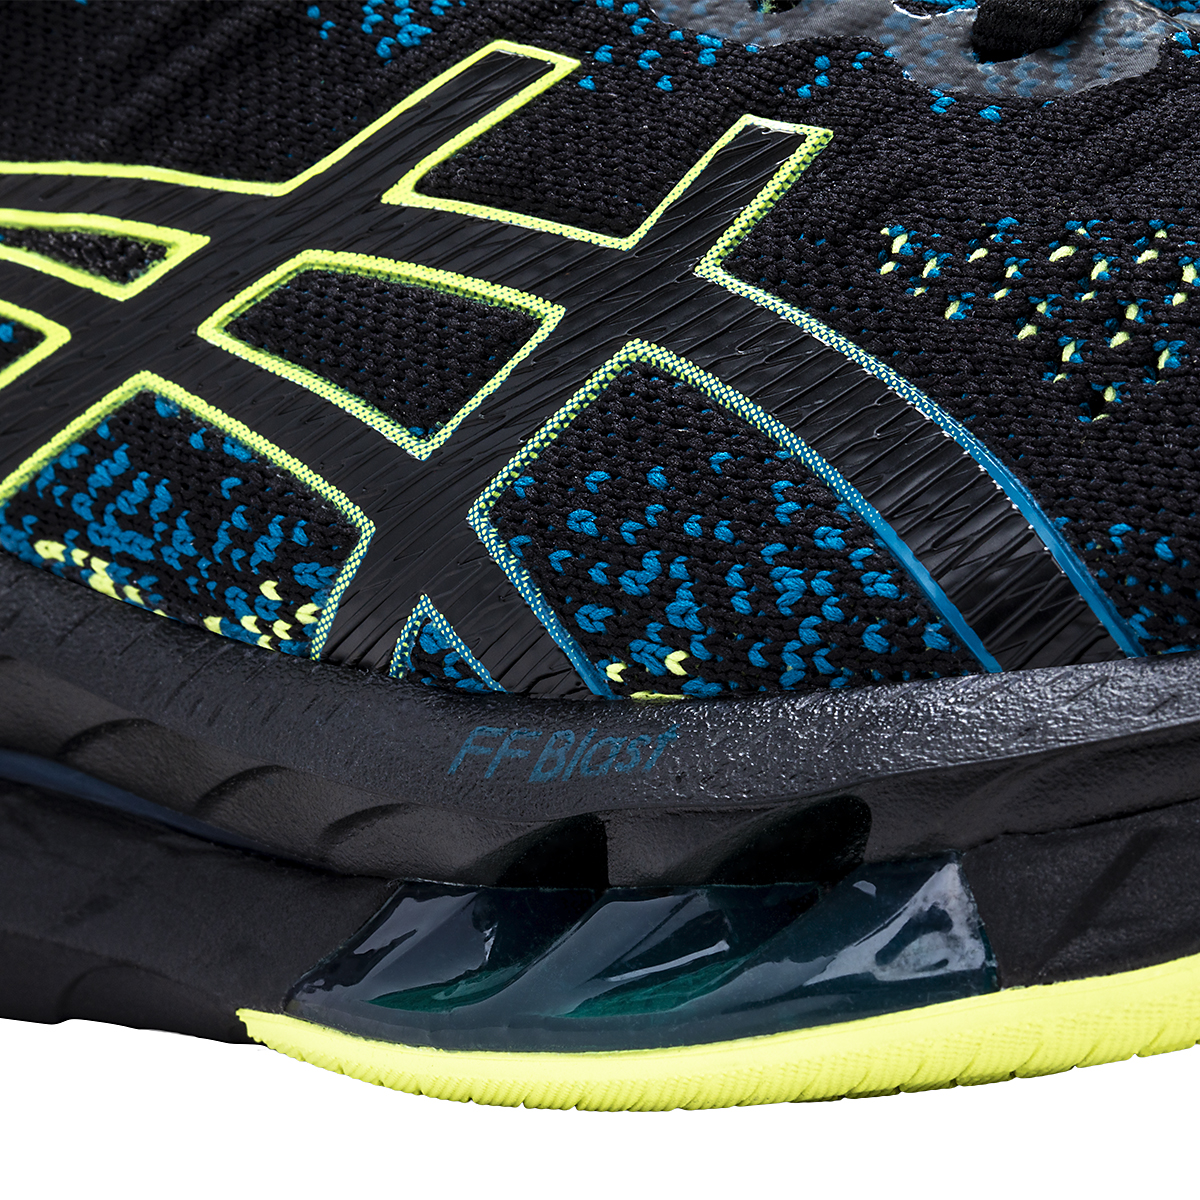 Men's Asics Kinsei Blast Running Shoe - Color: Black/Glow Yellow - Size: 6 - Width: Regular, Black/Glow Yellow, large, image 4